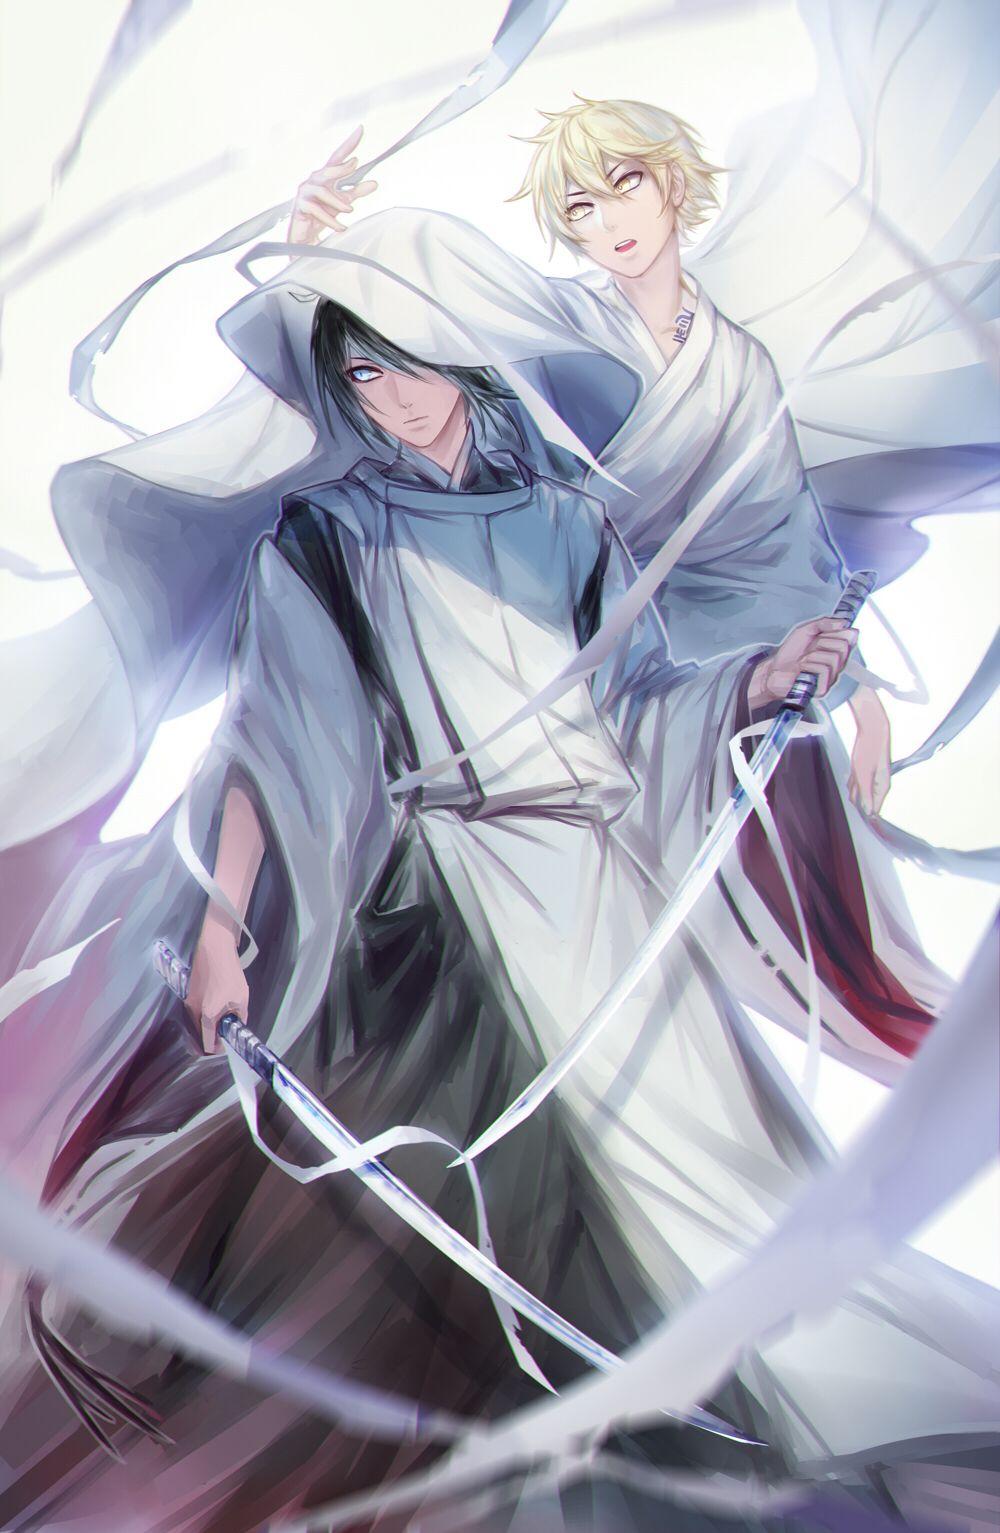 Download Noragami, Persona anime, Dibujos anime manga